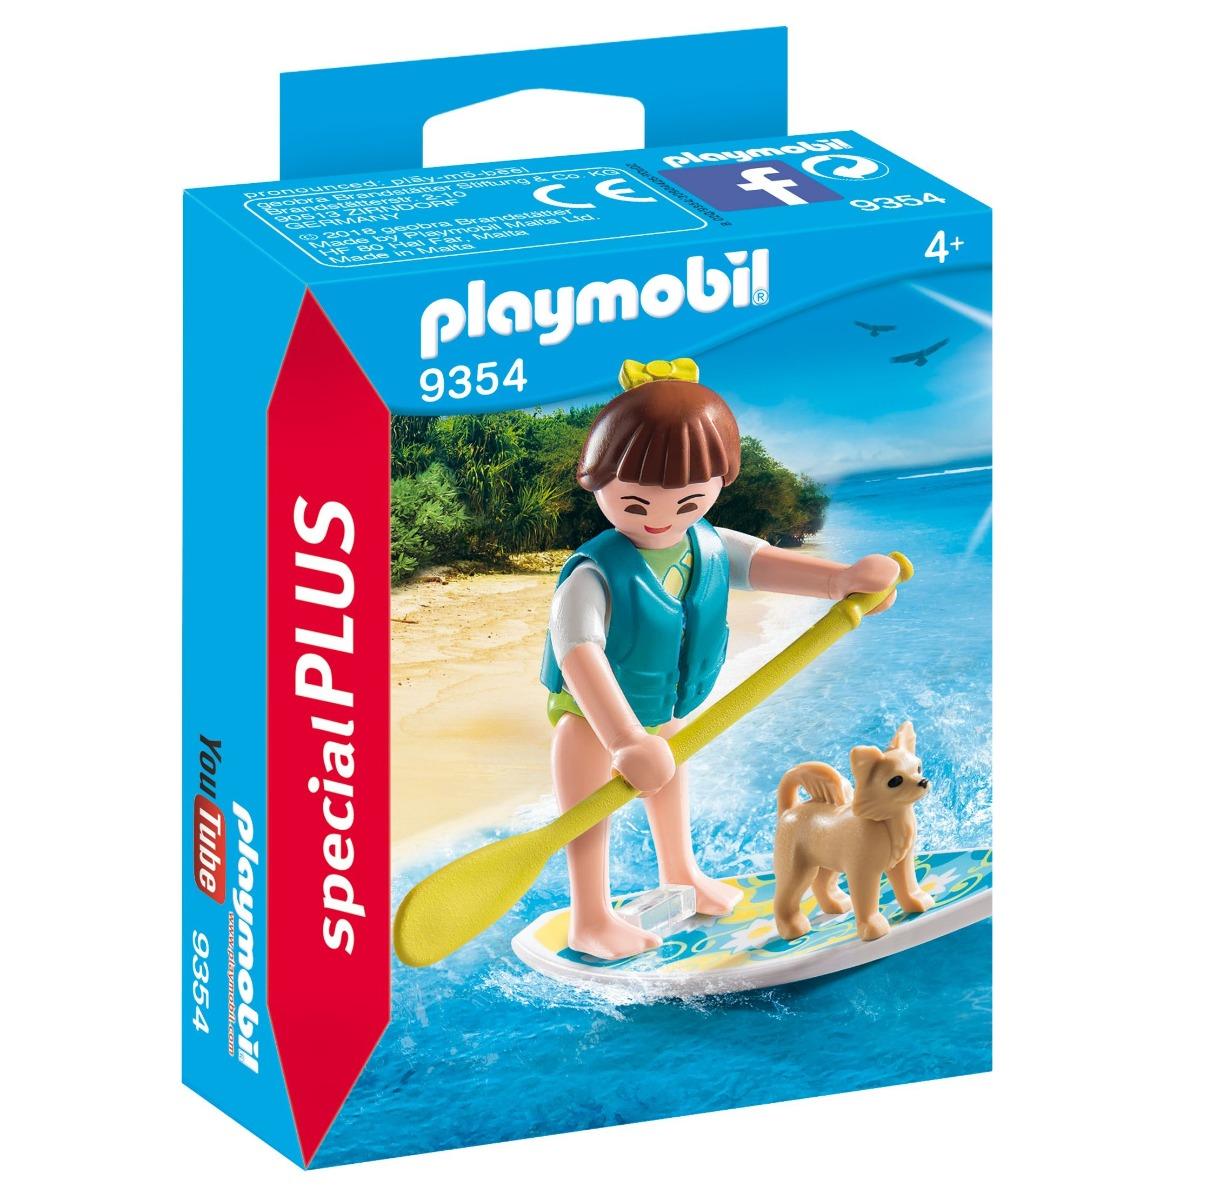 Playmobil PM9354 Figurina Surfer Si Catel imagine hippoland.ro